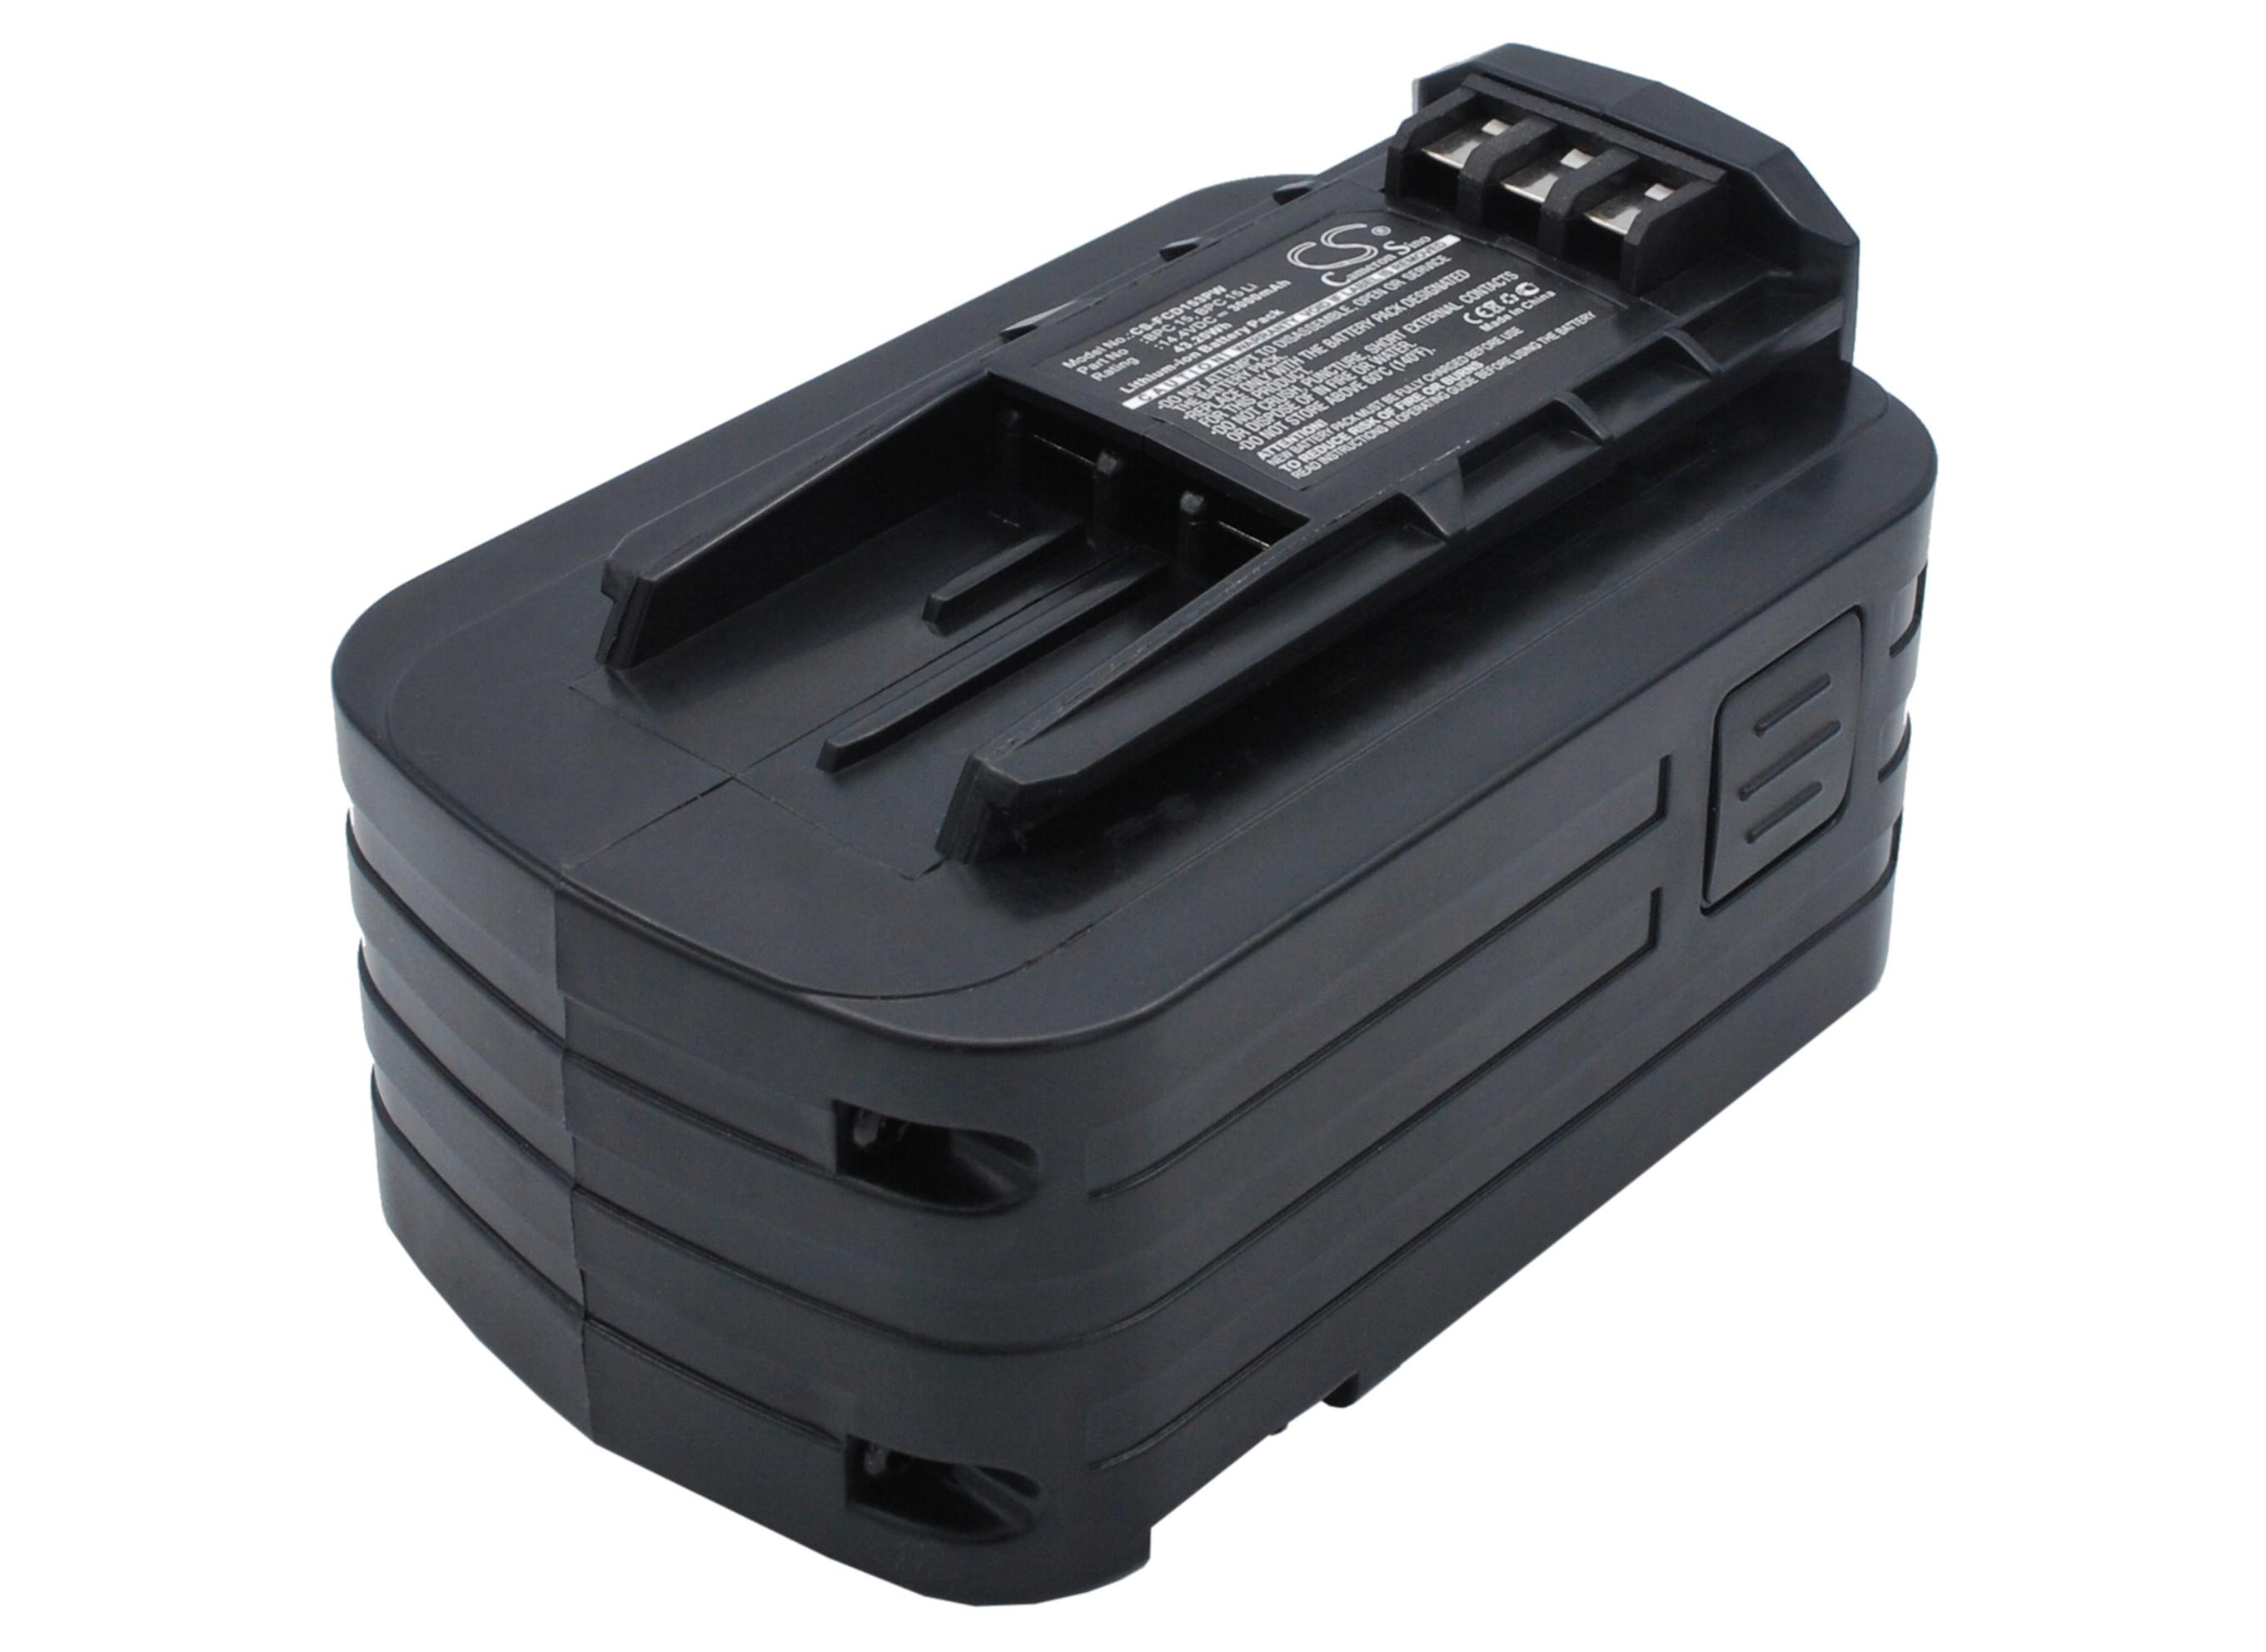 Cameron Sino baterie do nářadí pro FESTOOL T18 Cordless Drill/Driver 14.4V Li-ion 3000mAh černá - neoriginální